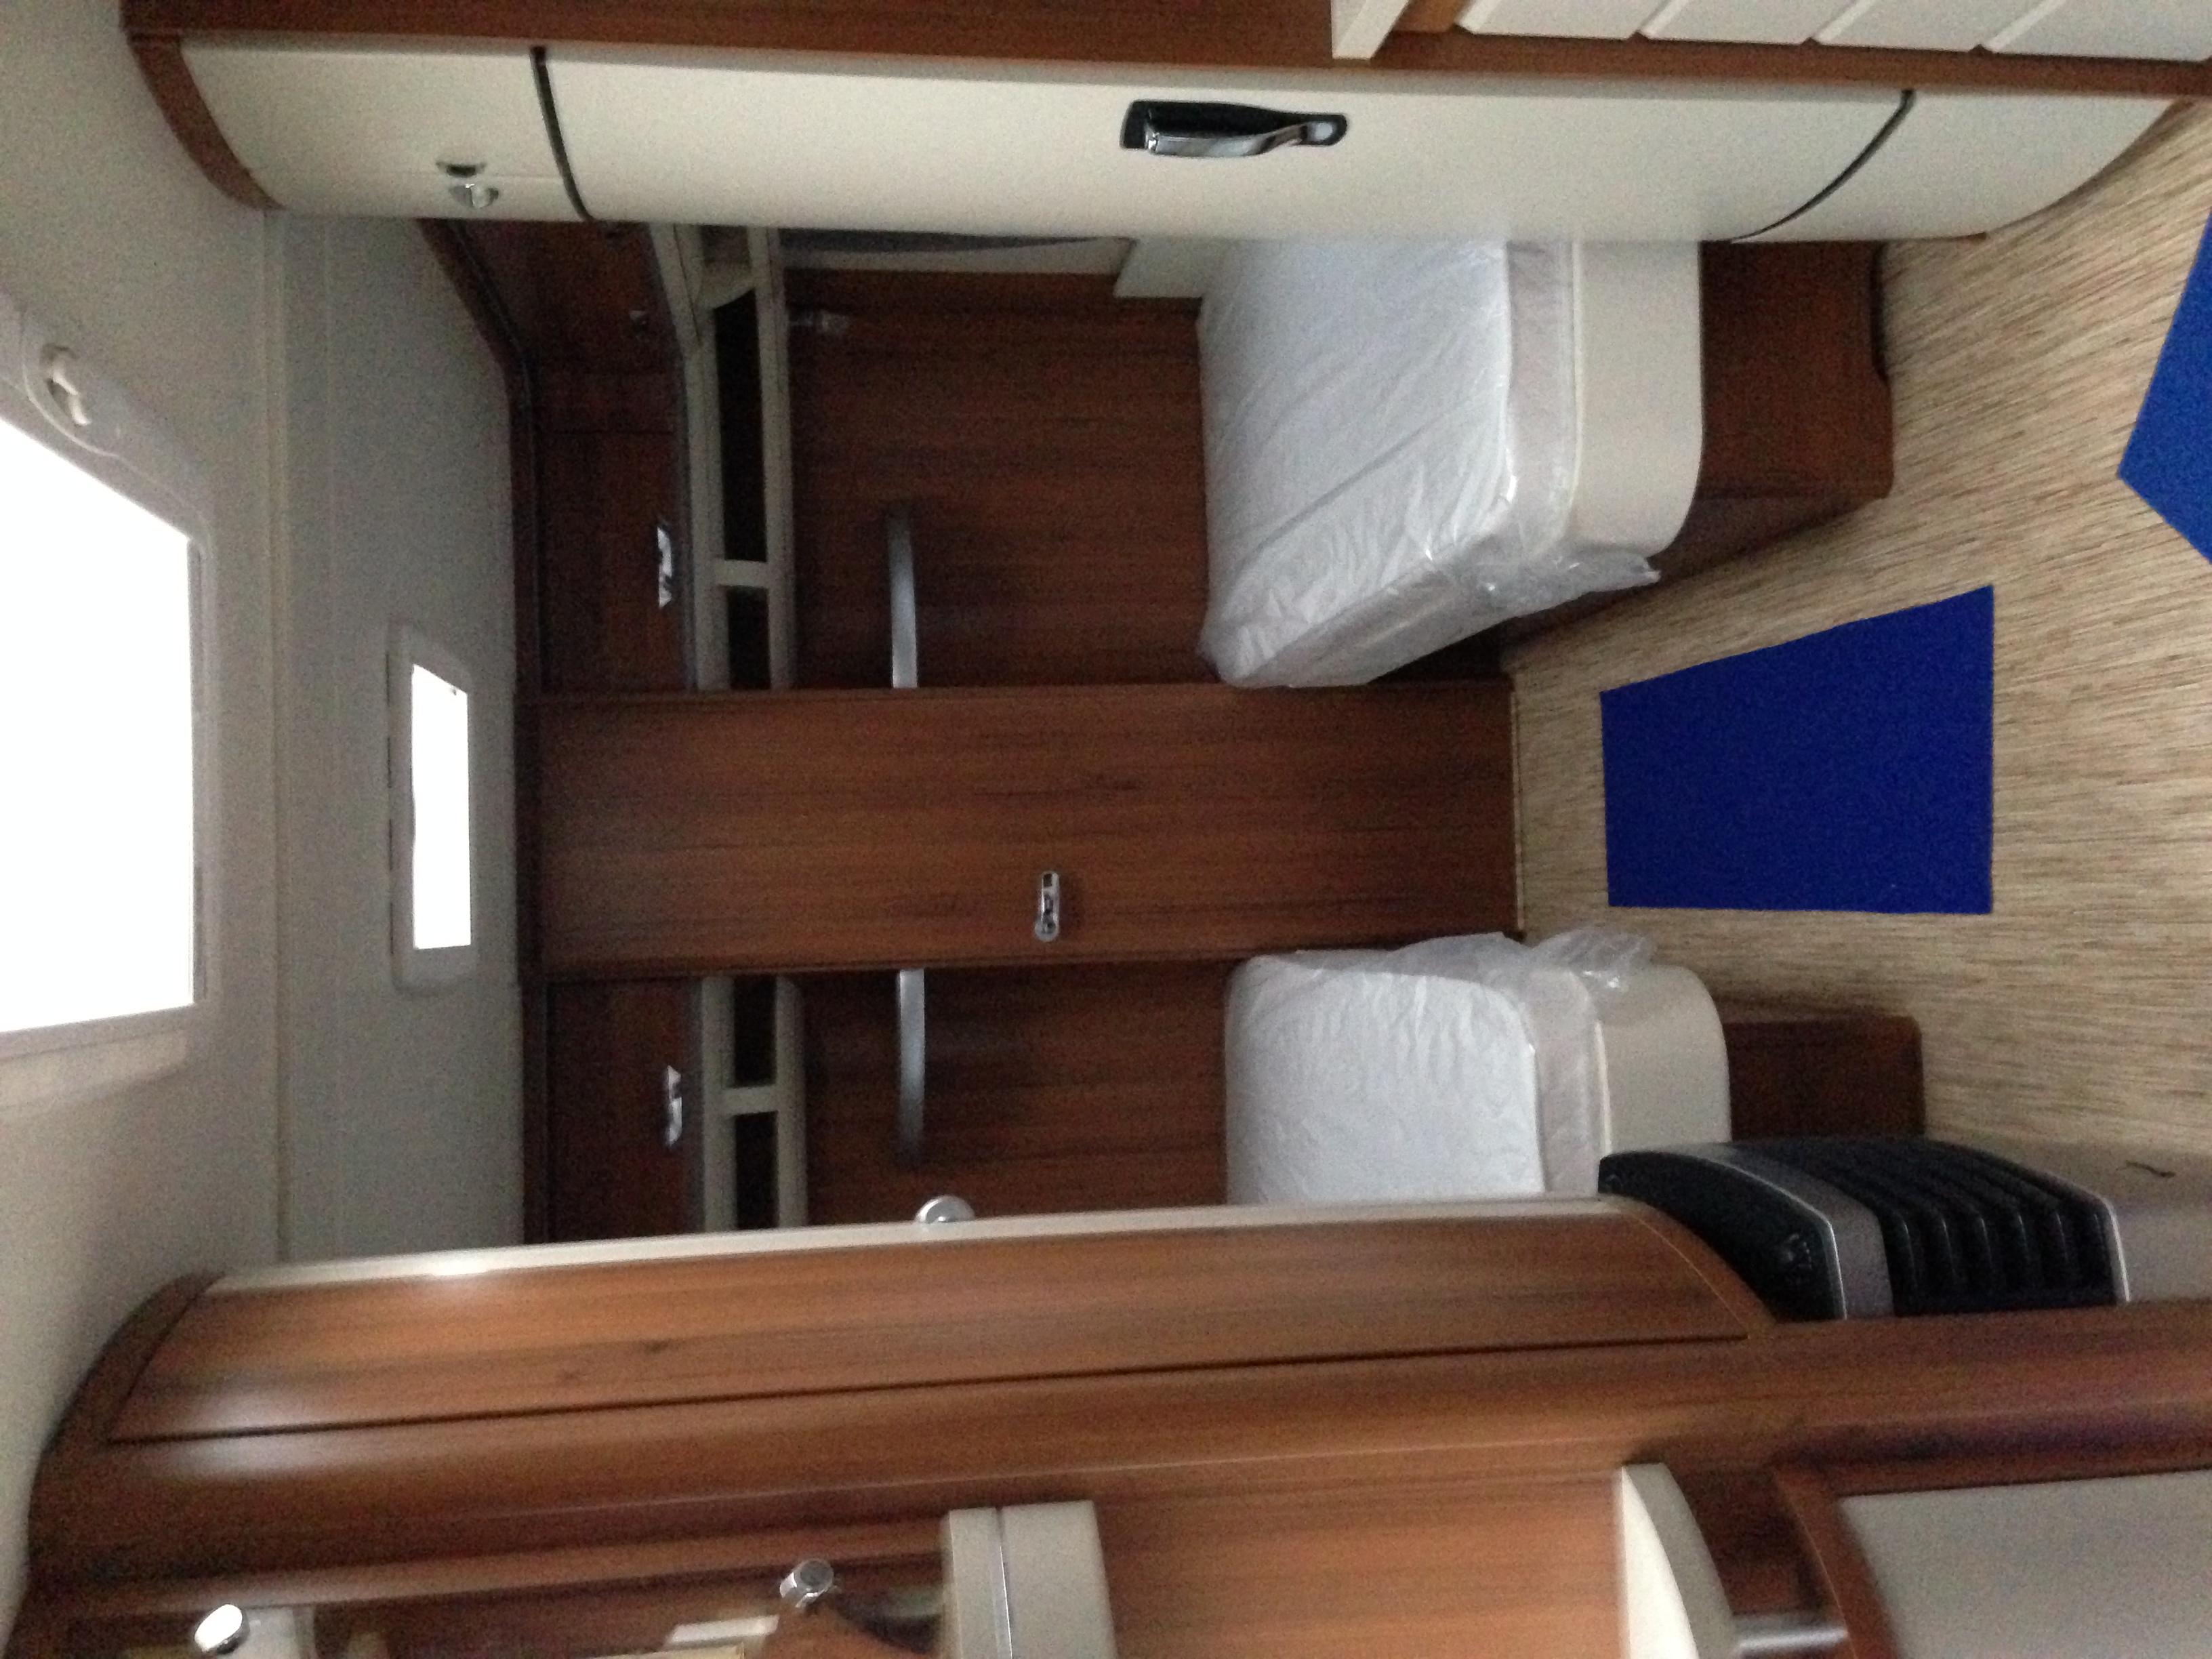 hobby 560 wlu premium neuf de 2013 caravane en vente oberschaeffolsheim rhin 67. Black Bedroom Furniture Sets. Home Design Ideas